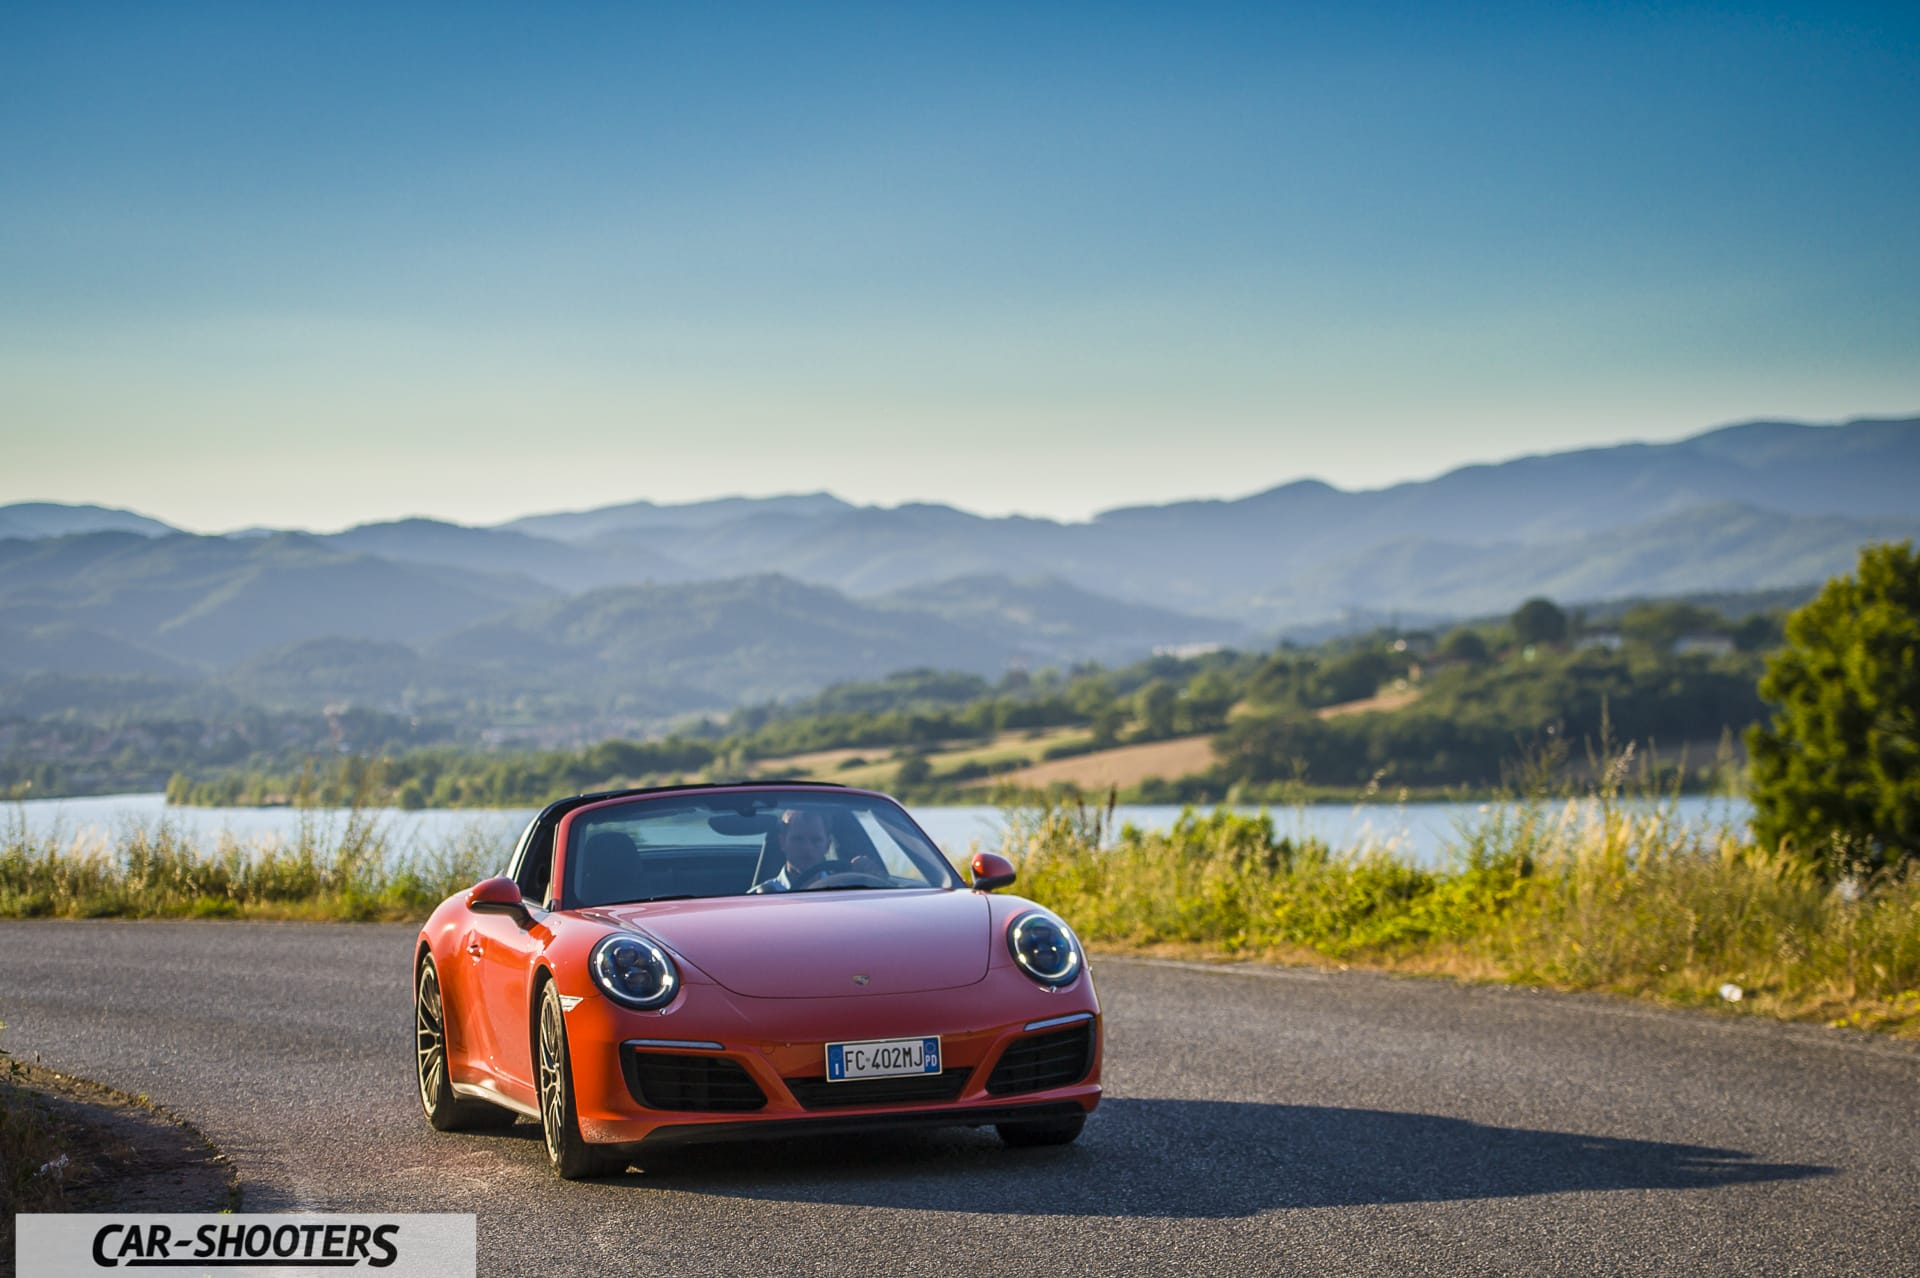 Porsche 911 Targa 4S Lago di Bilancino